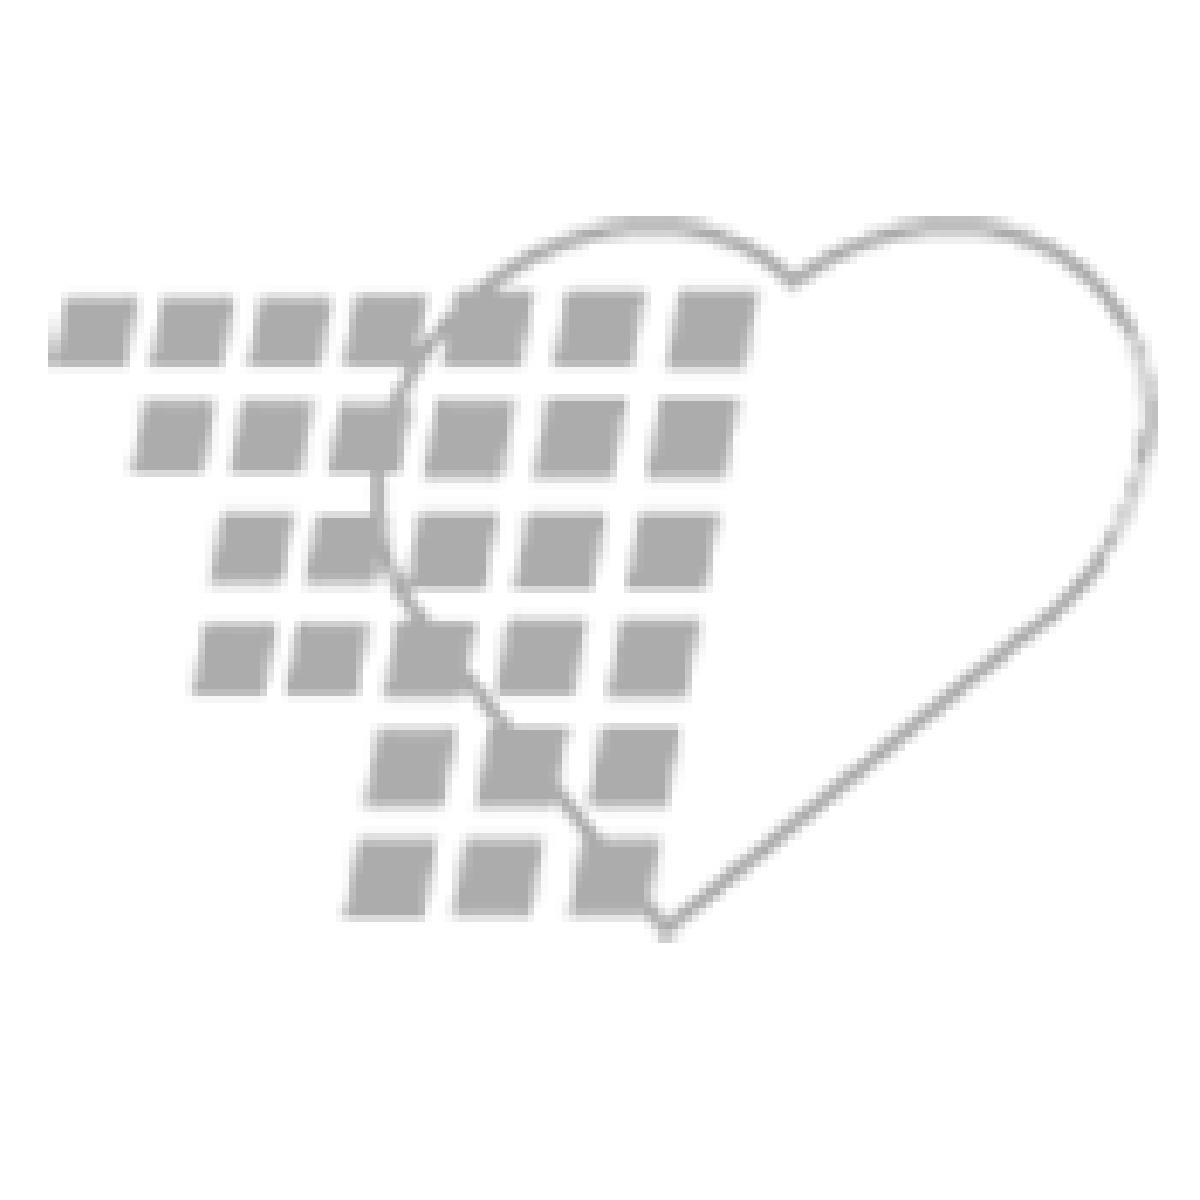 02-70-5241 Specula Adaptor for Diagnostix Otoscope